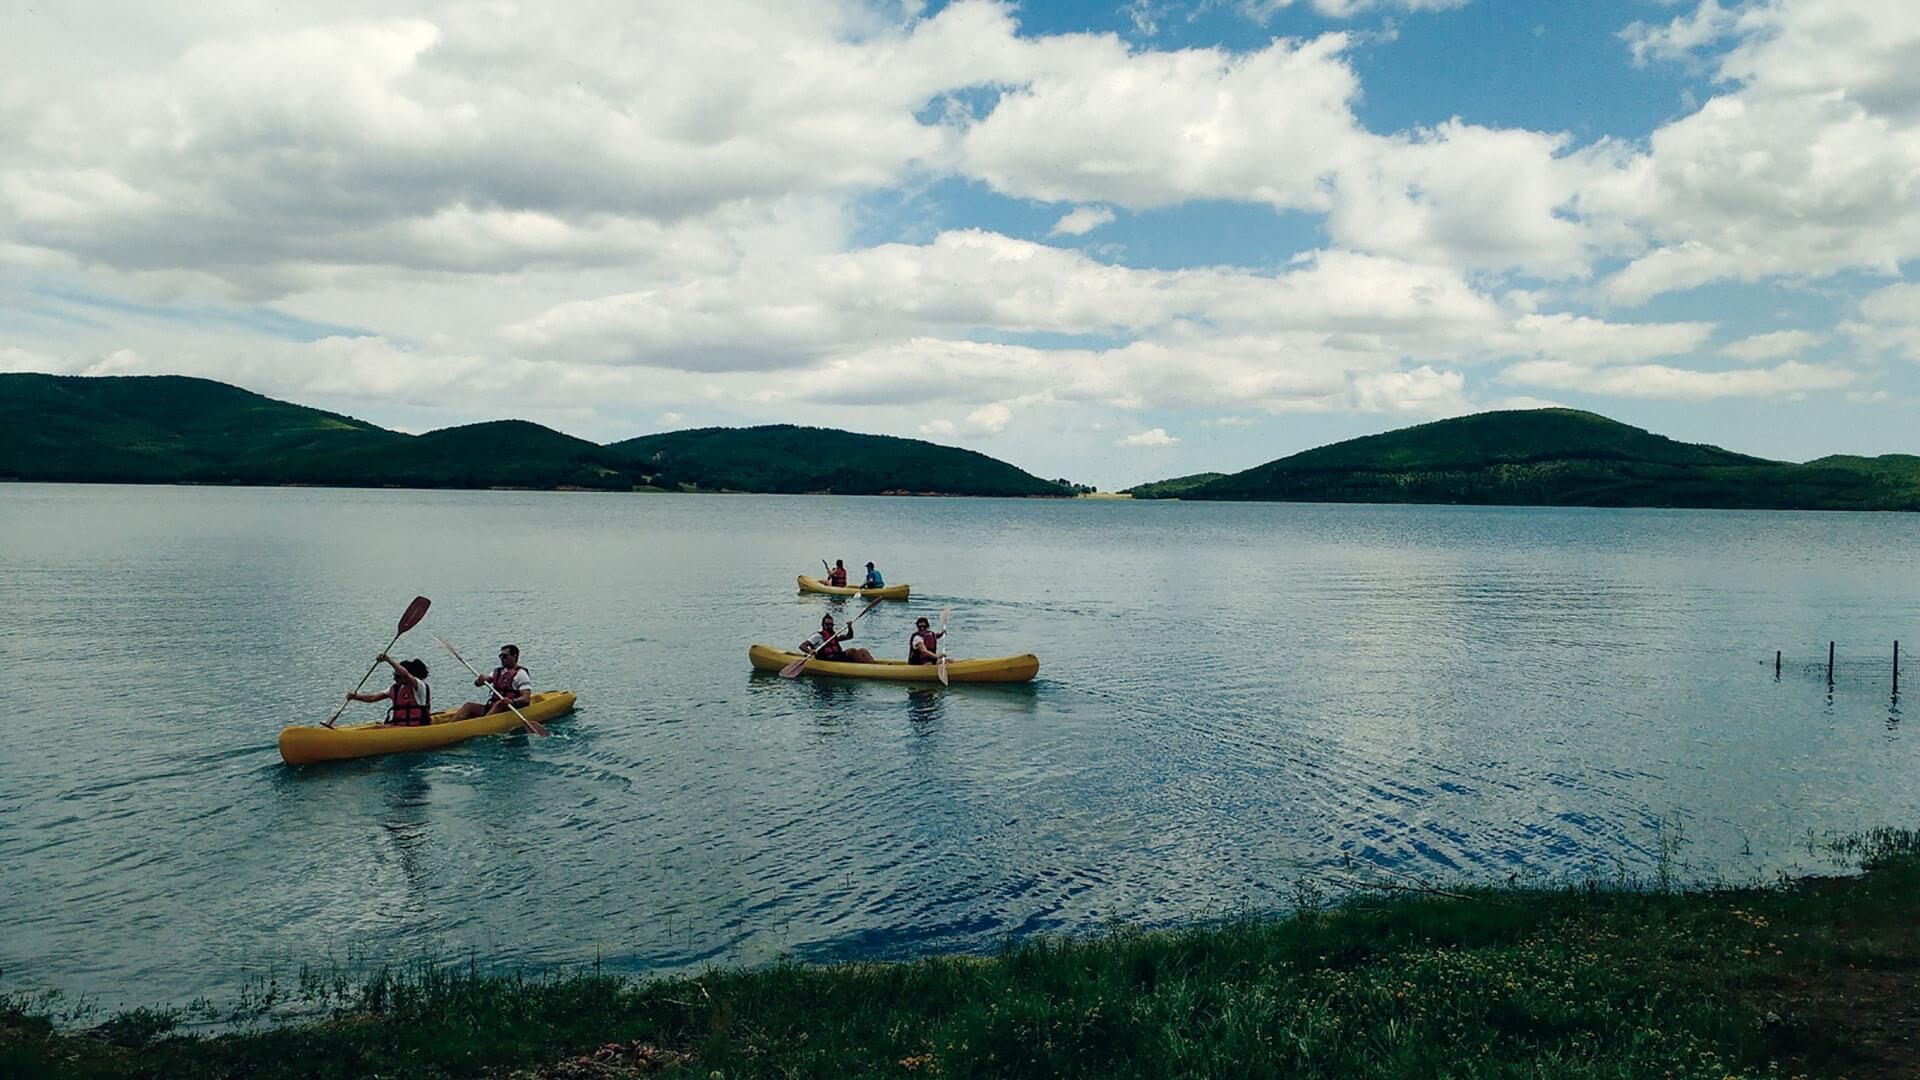 plastira-lake-greece-la-vie-en-blog-all-rights-reserved-10